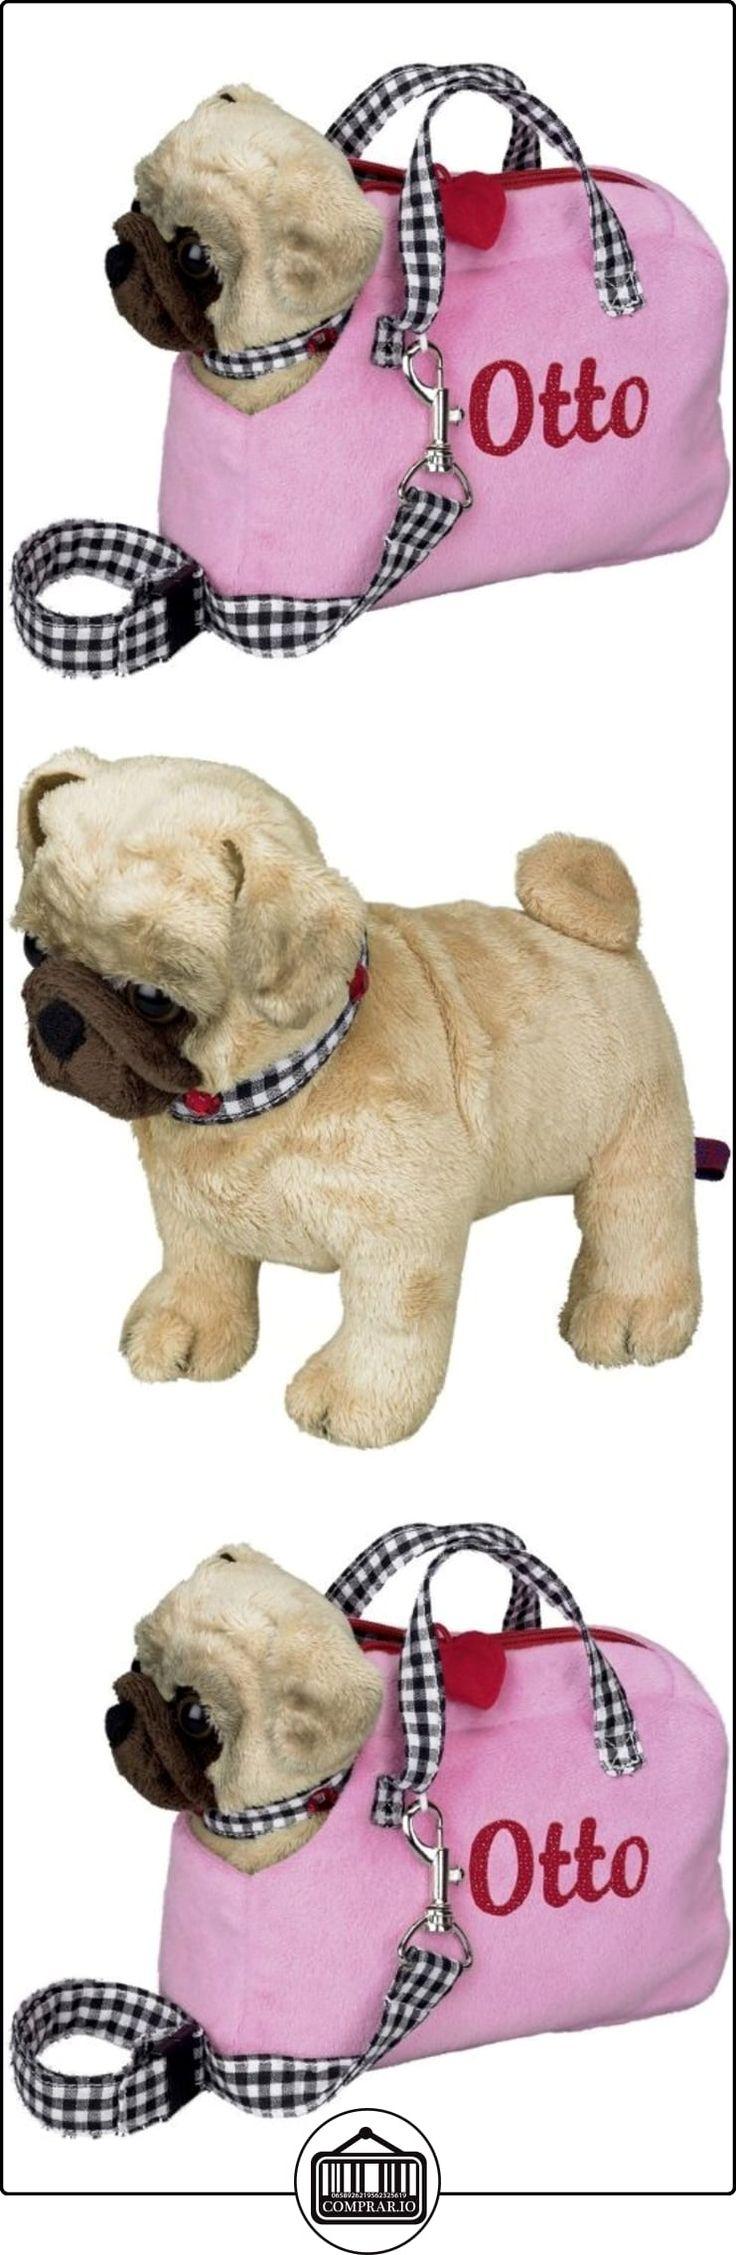 Funny animal Parade perro pug en bolsa, Modelo # 25533  ✿ Regalos para recién nacidos - Bebes ✿ ▬► Ver oferta: http://comprar.io/goto/B008JC2K86